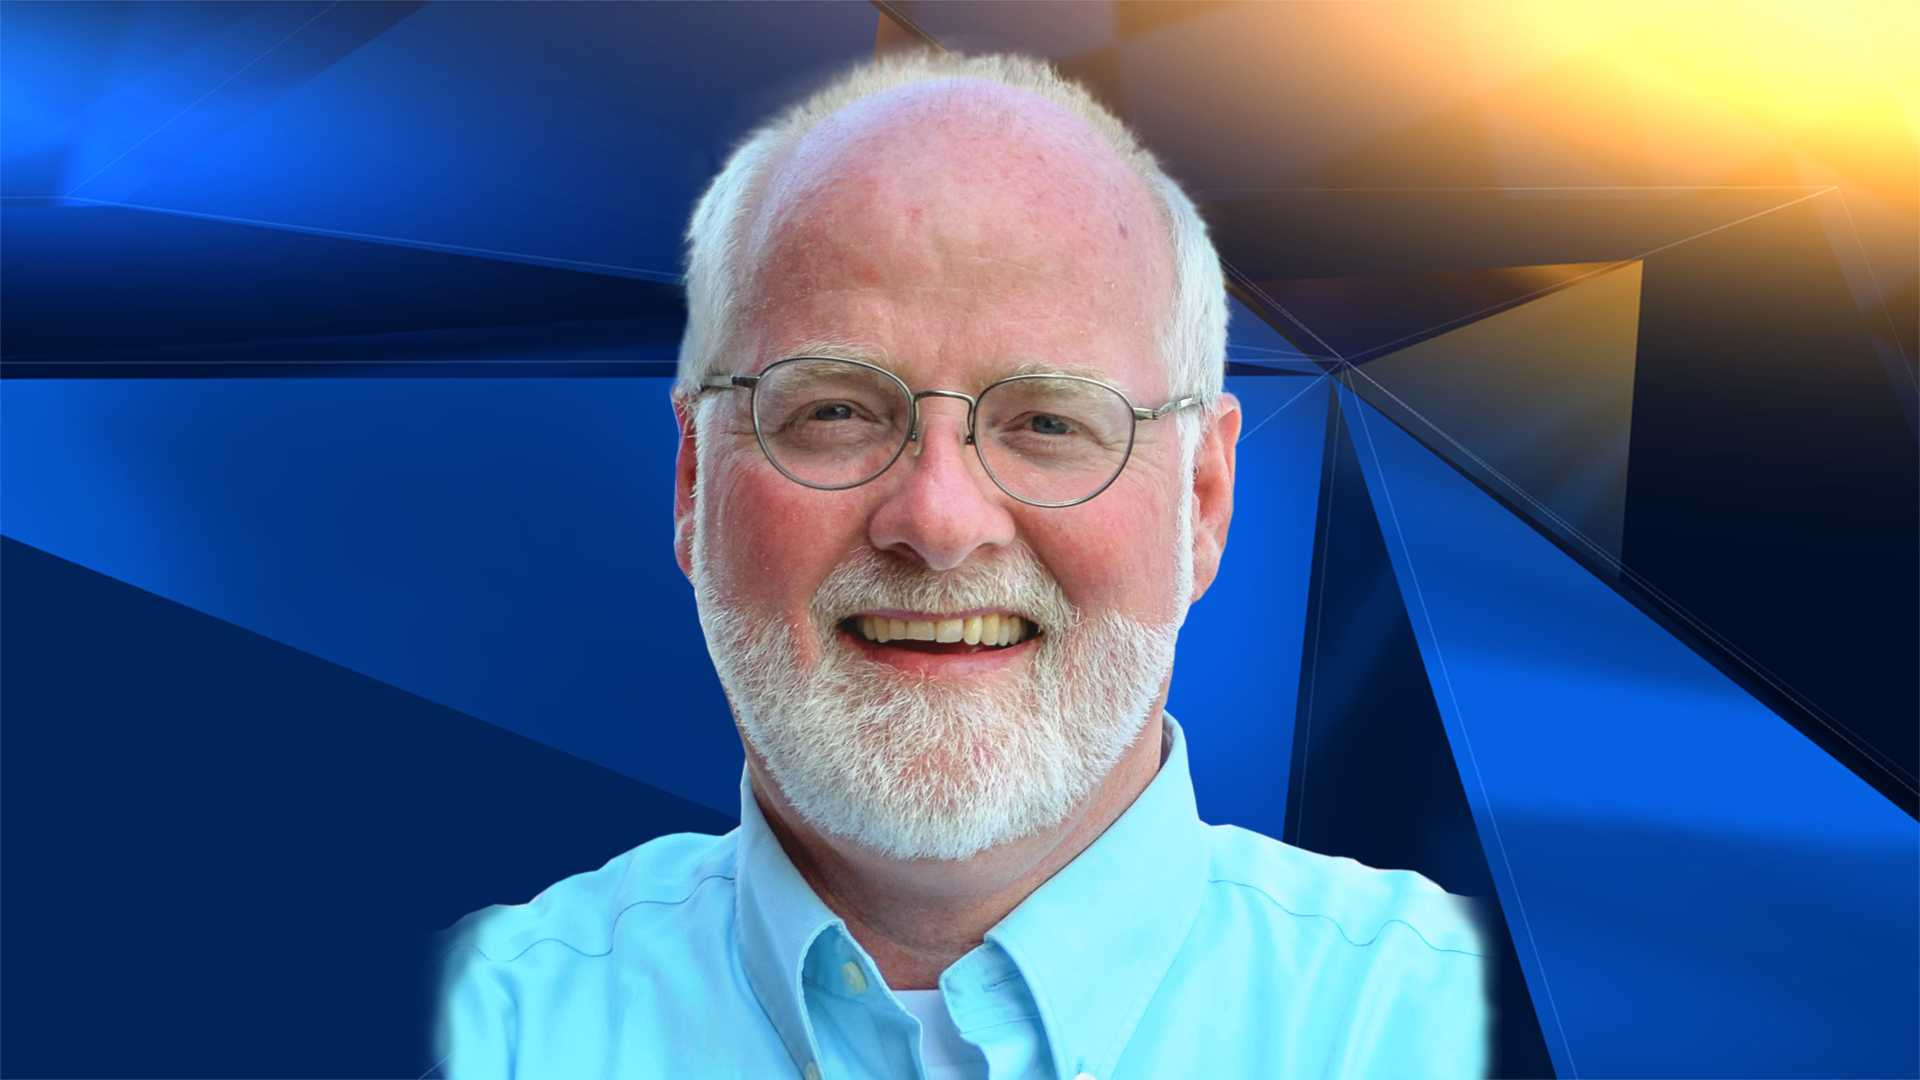 David Alvey